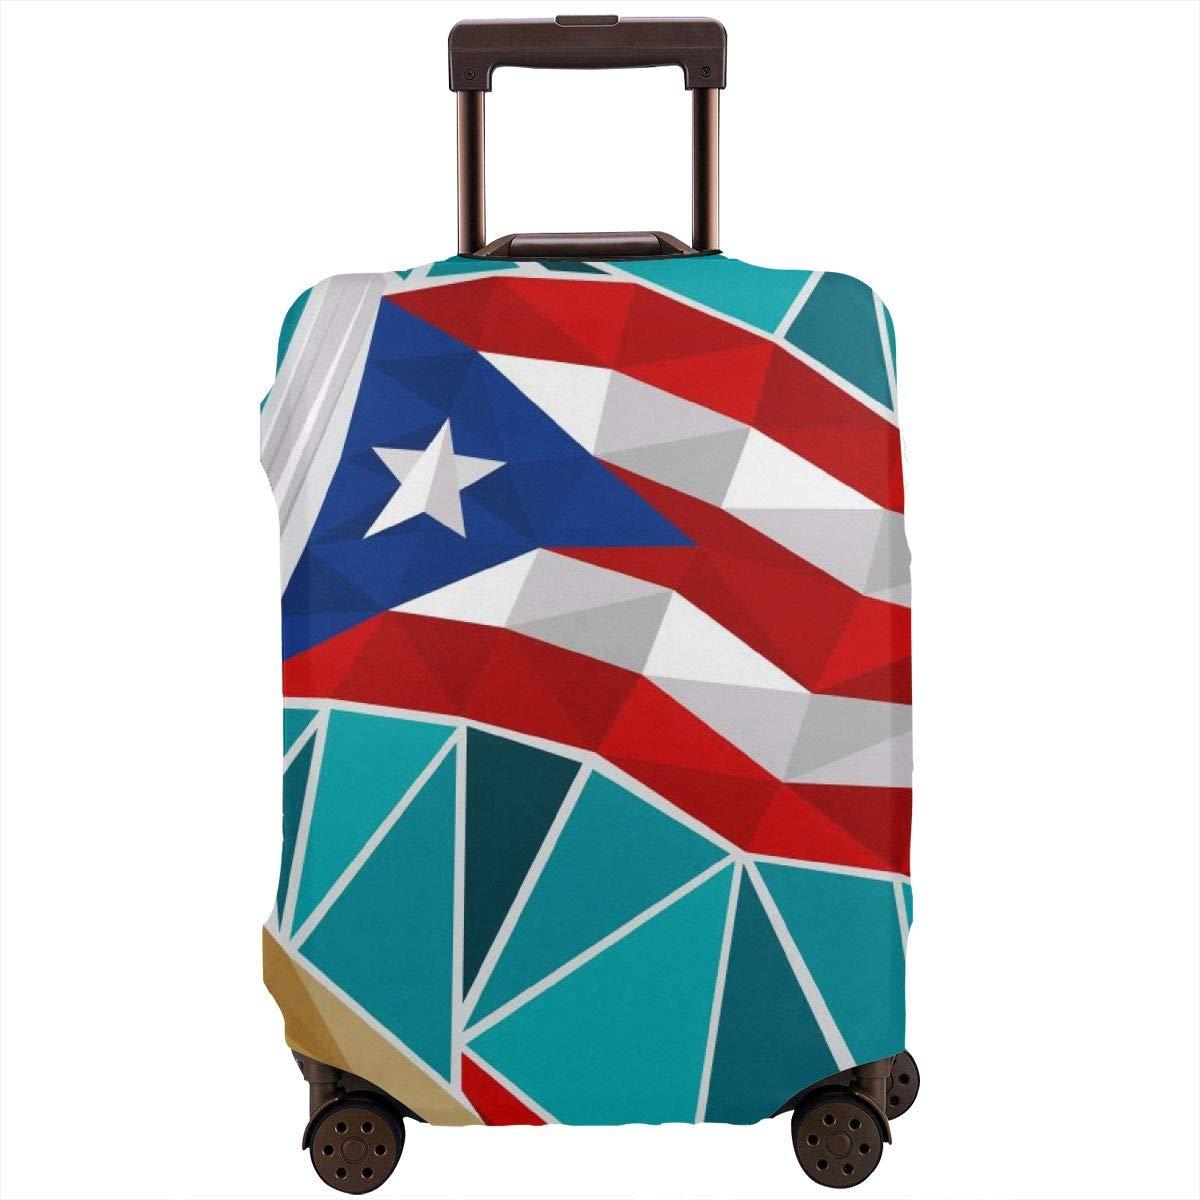 Louise Morrison プエルトリコ国旗 旅行かばん プロテクター スーツケースカバー 18~32インチ S ブラック lxhei83_29659641 B07SGW67JQ  Small